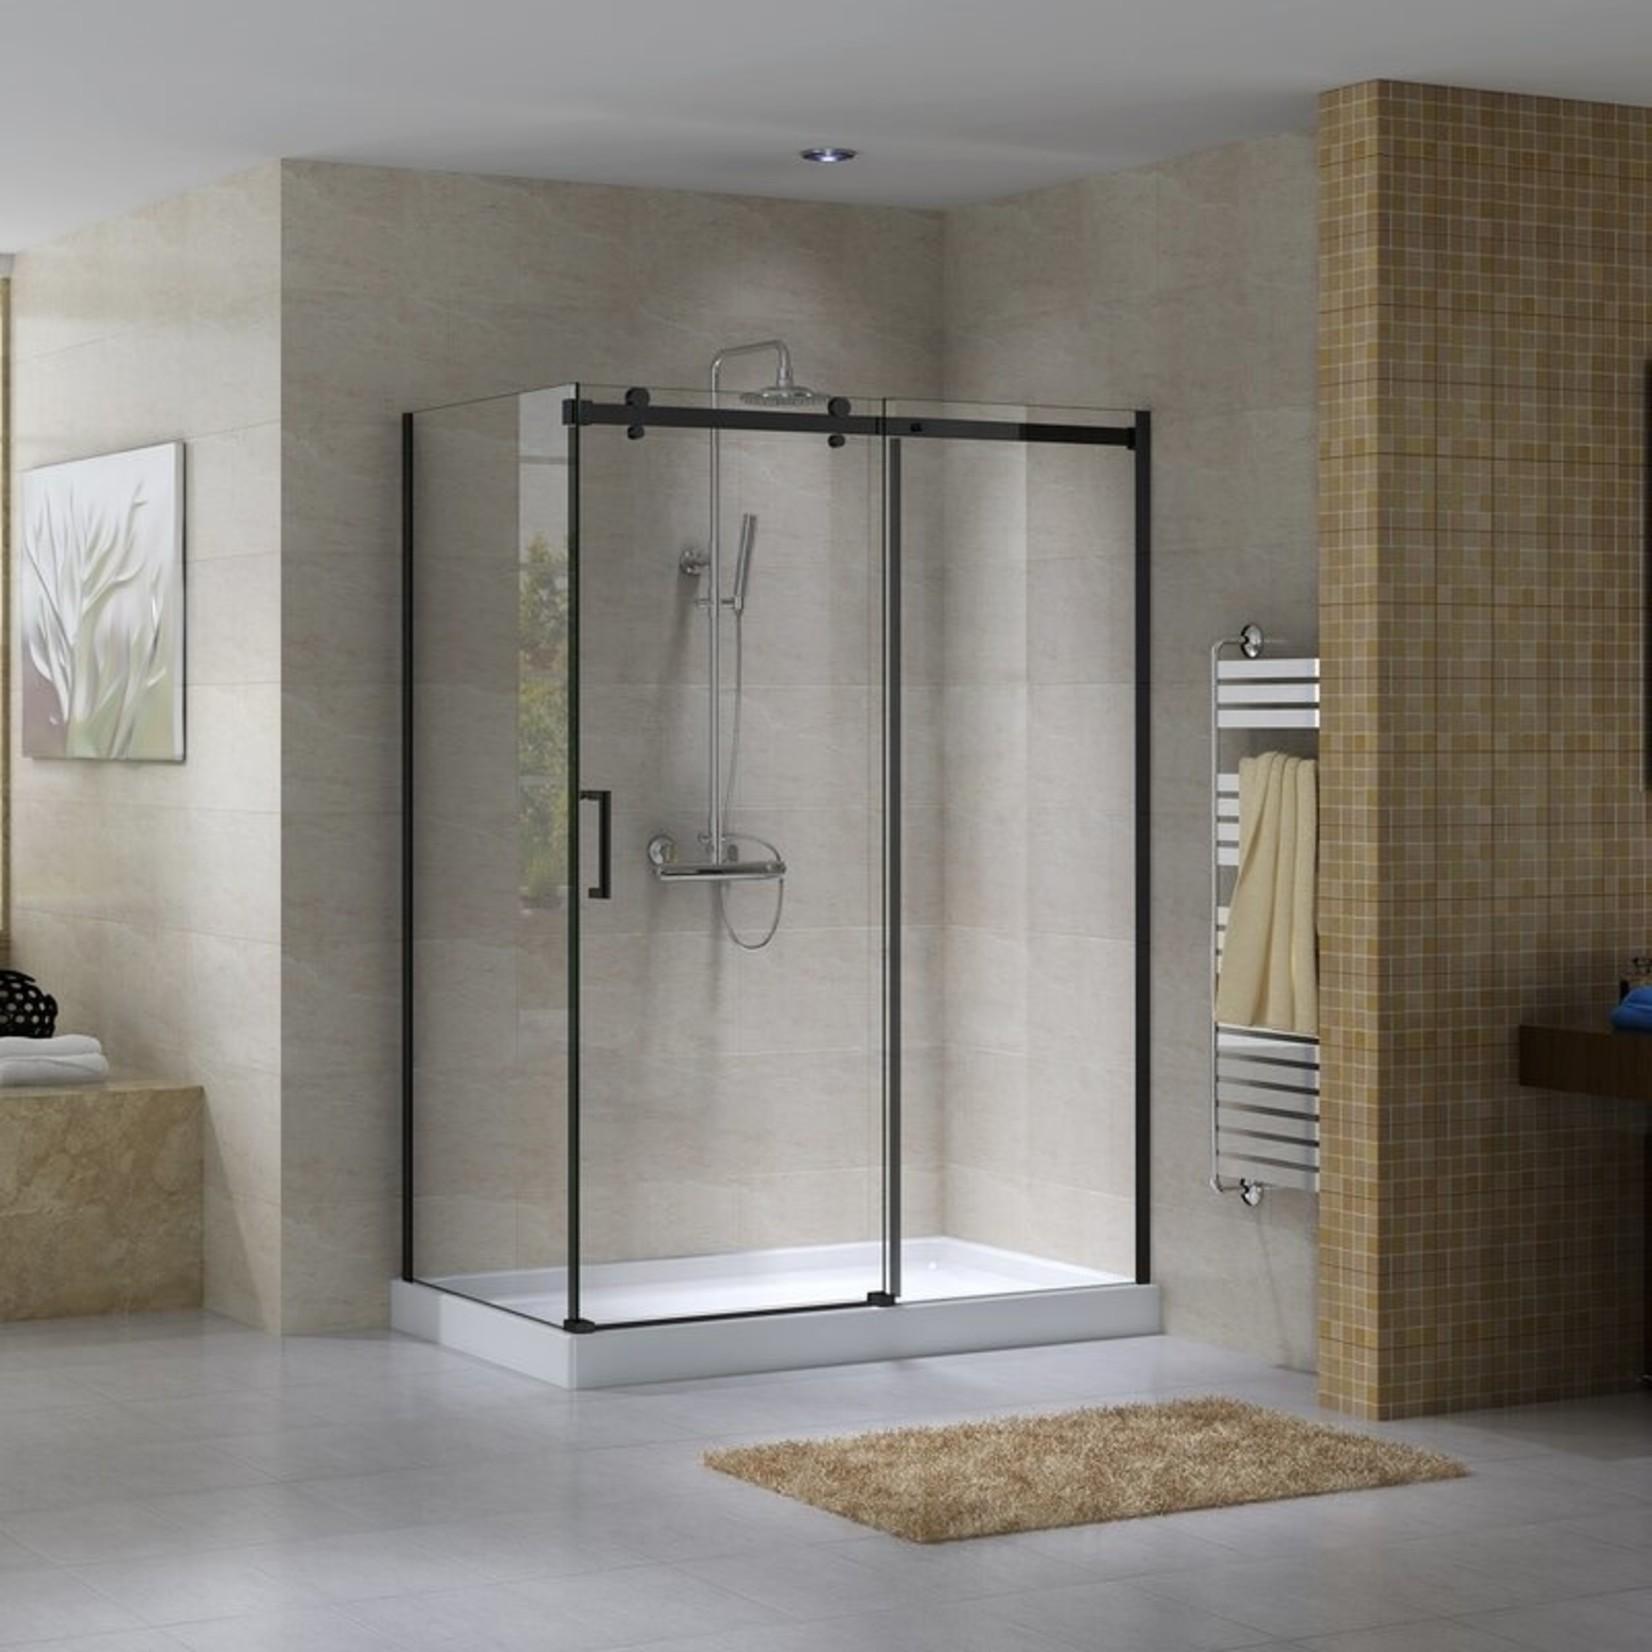 Reversible shower set 36x48 black Quartz Jade series